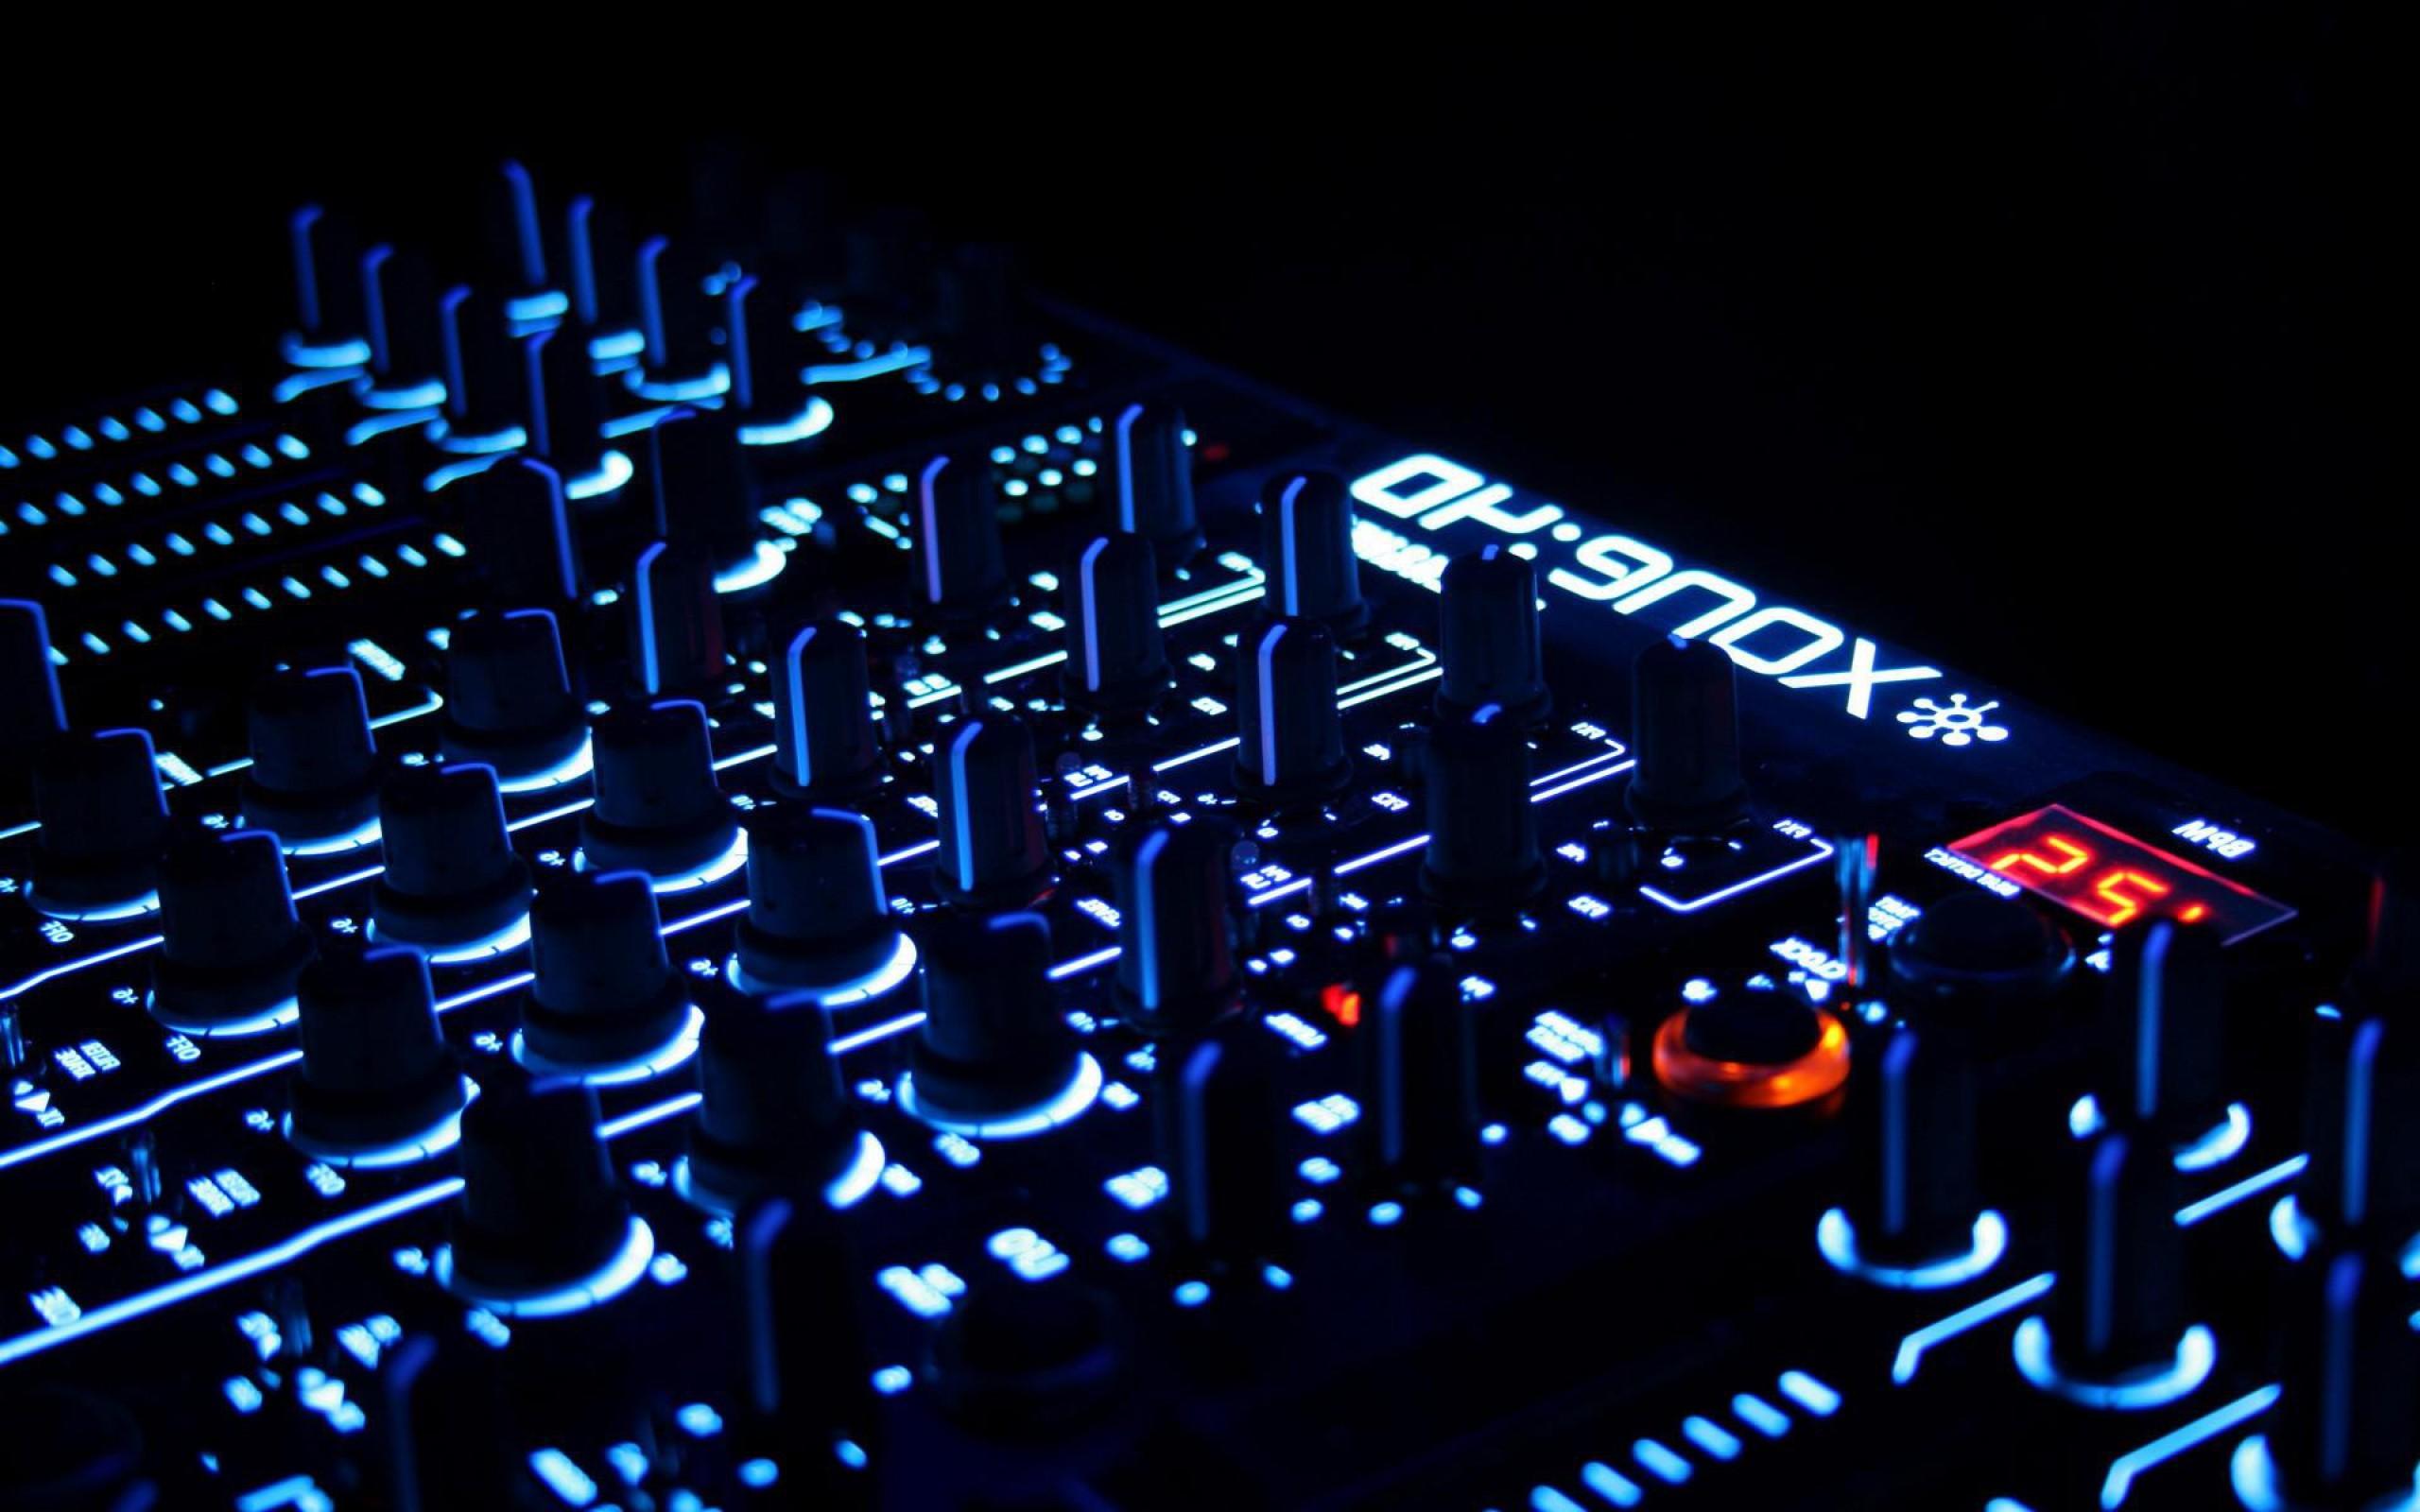 wallpaper.wiki-Mixer-DJ-Wallpapers-Download-PIC-WPE0010243